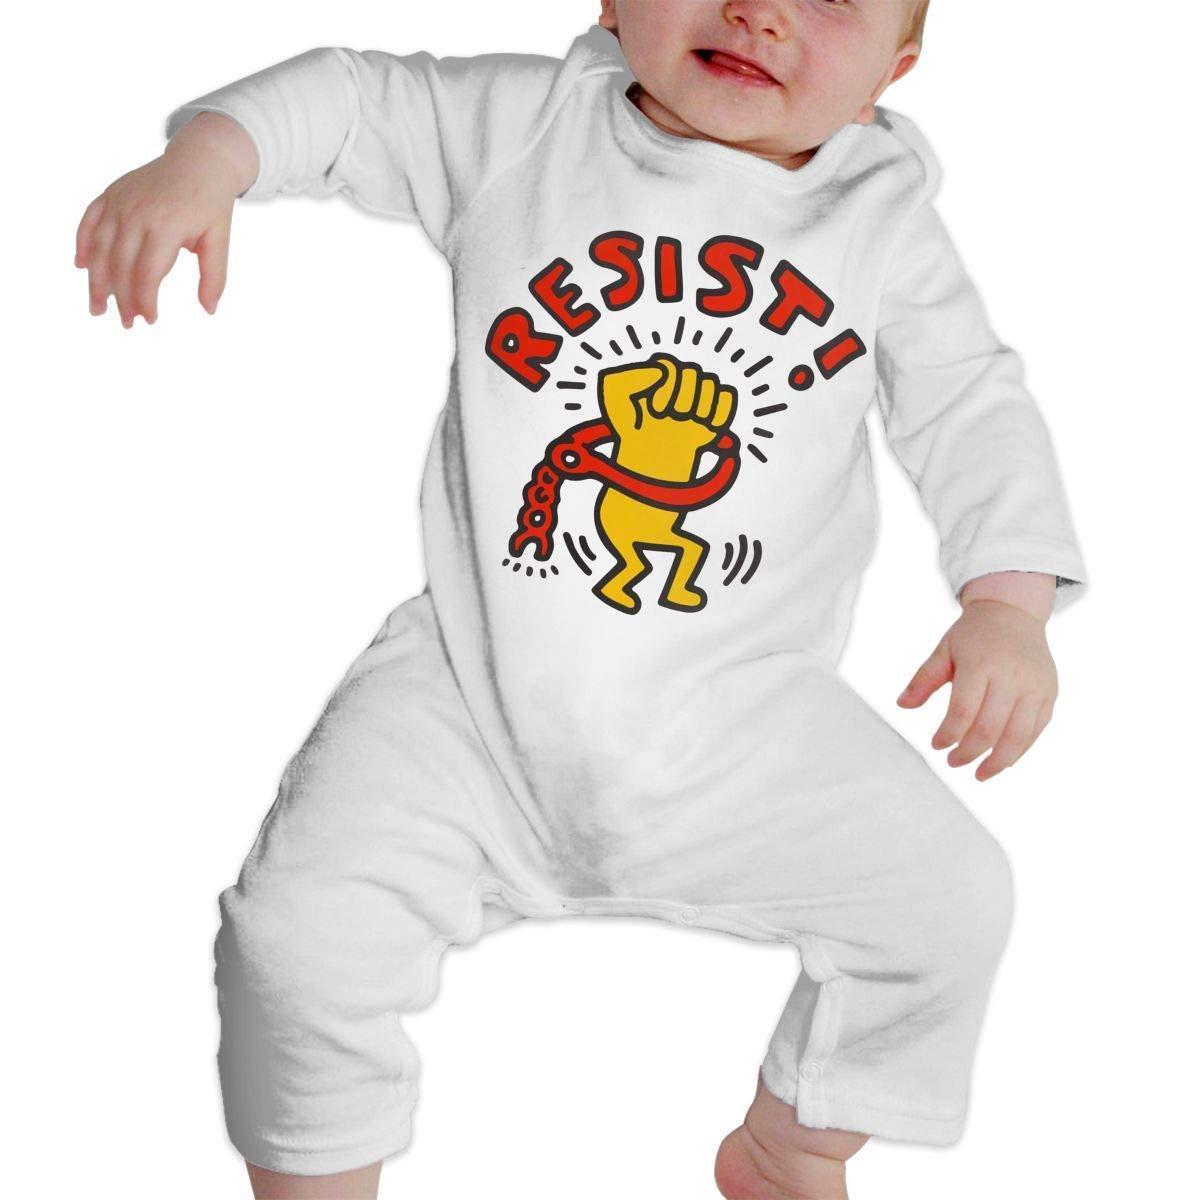 Toddler Baby Boy Girl Jumpsuit Keith Haring Resist Infant Long Sleeve Romper Jumpsuit